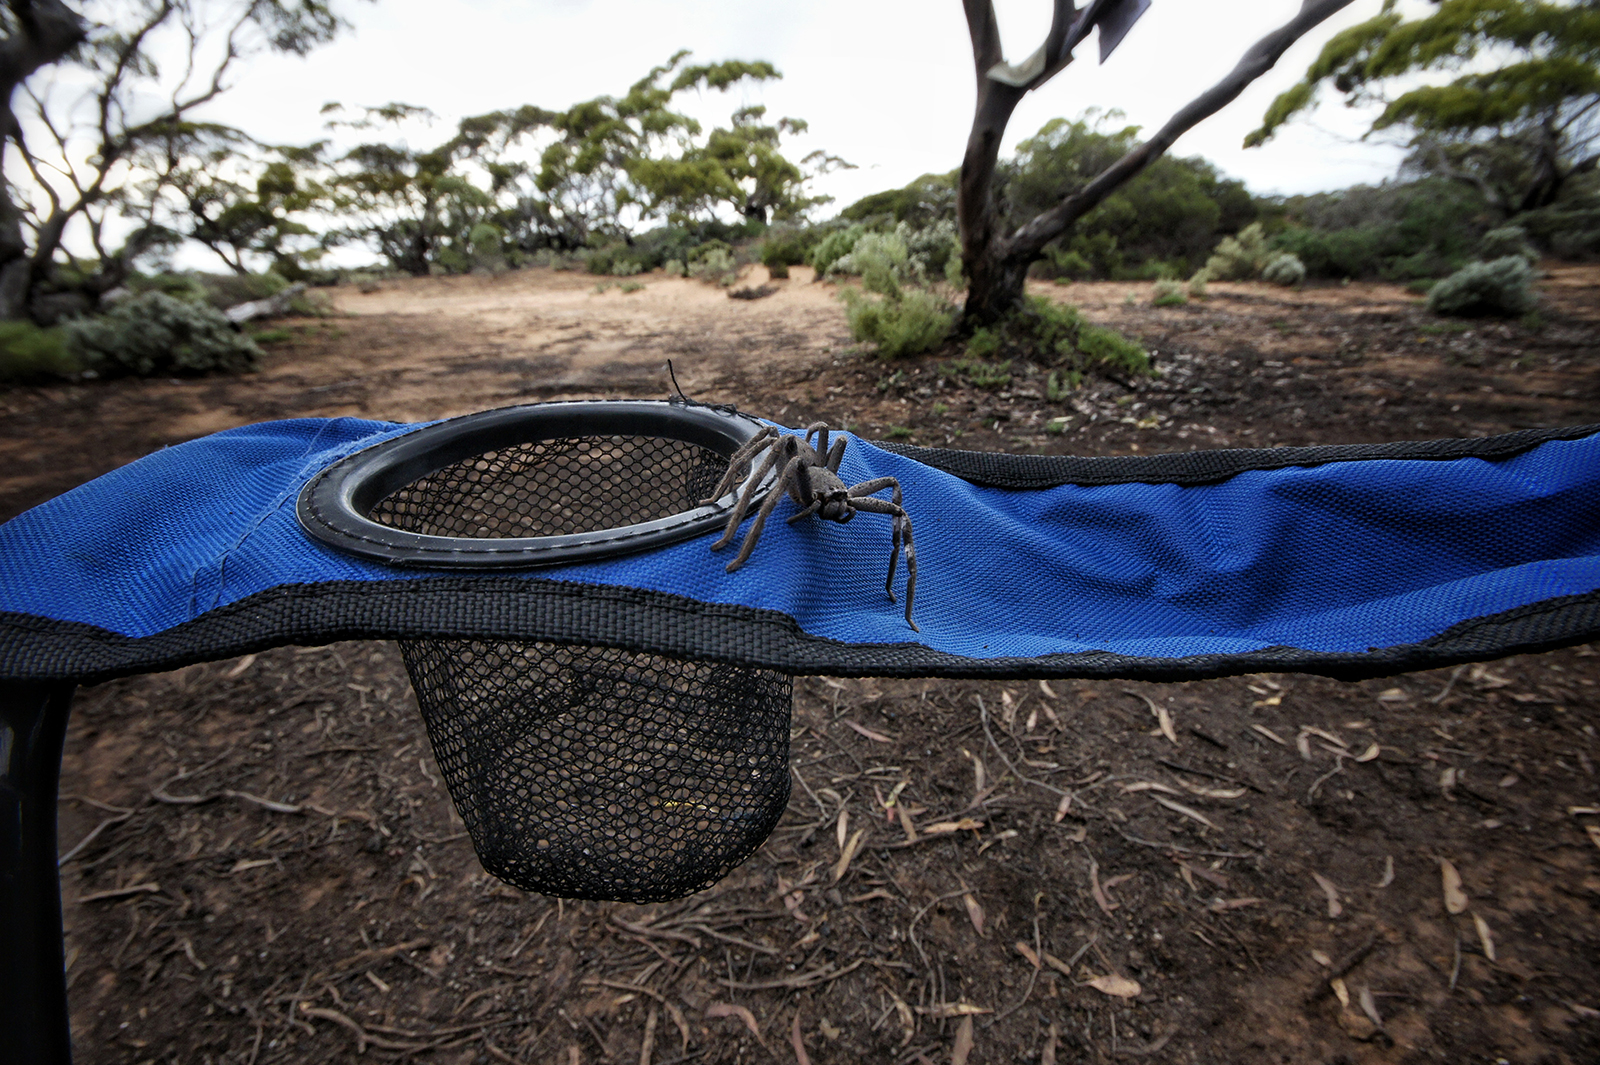 Kieran Rae Borderwalk Outback Australia Spider Huntsman Camping